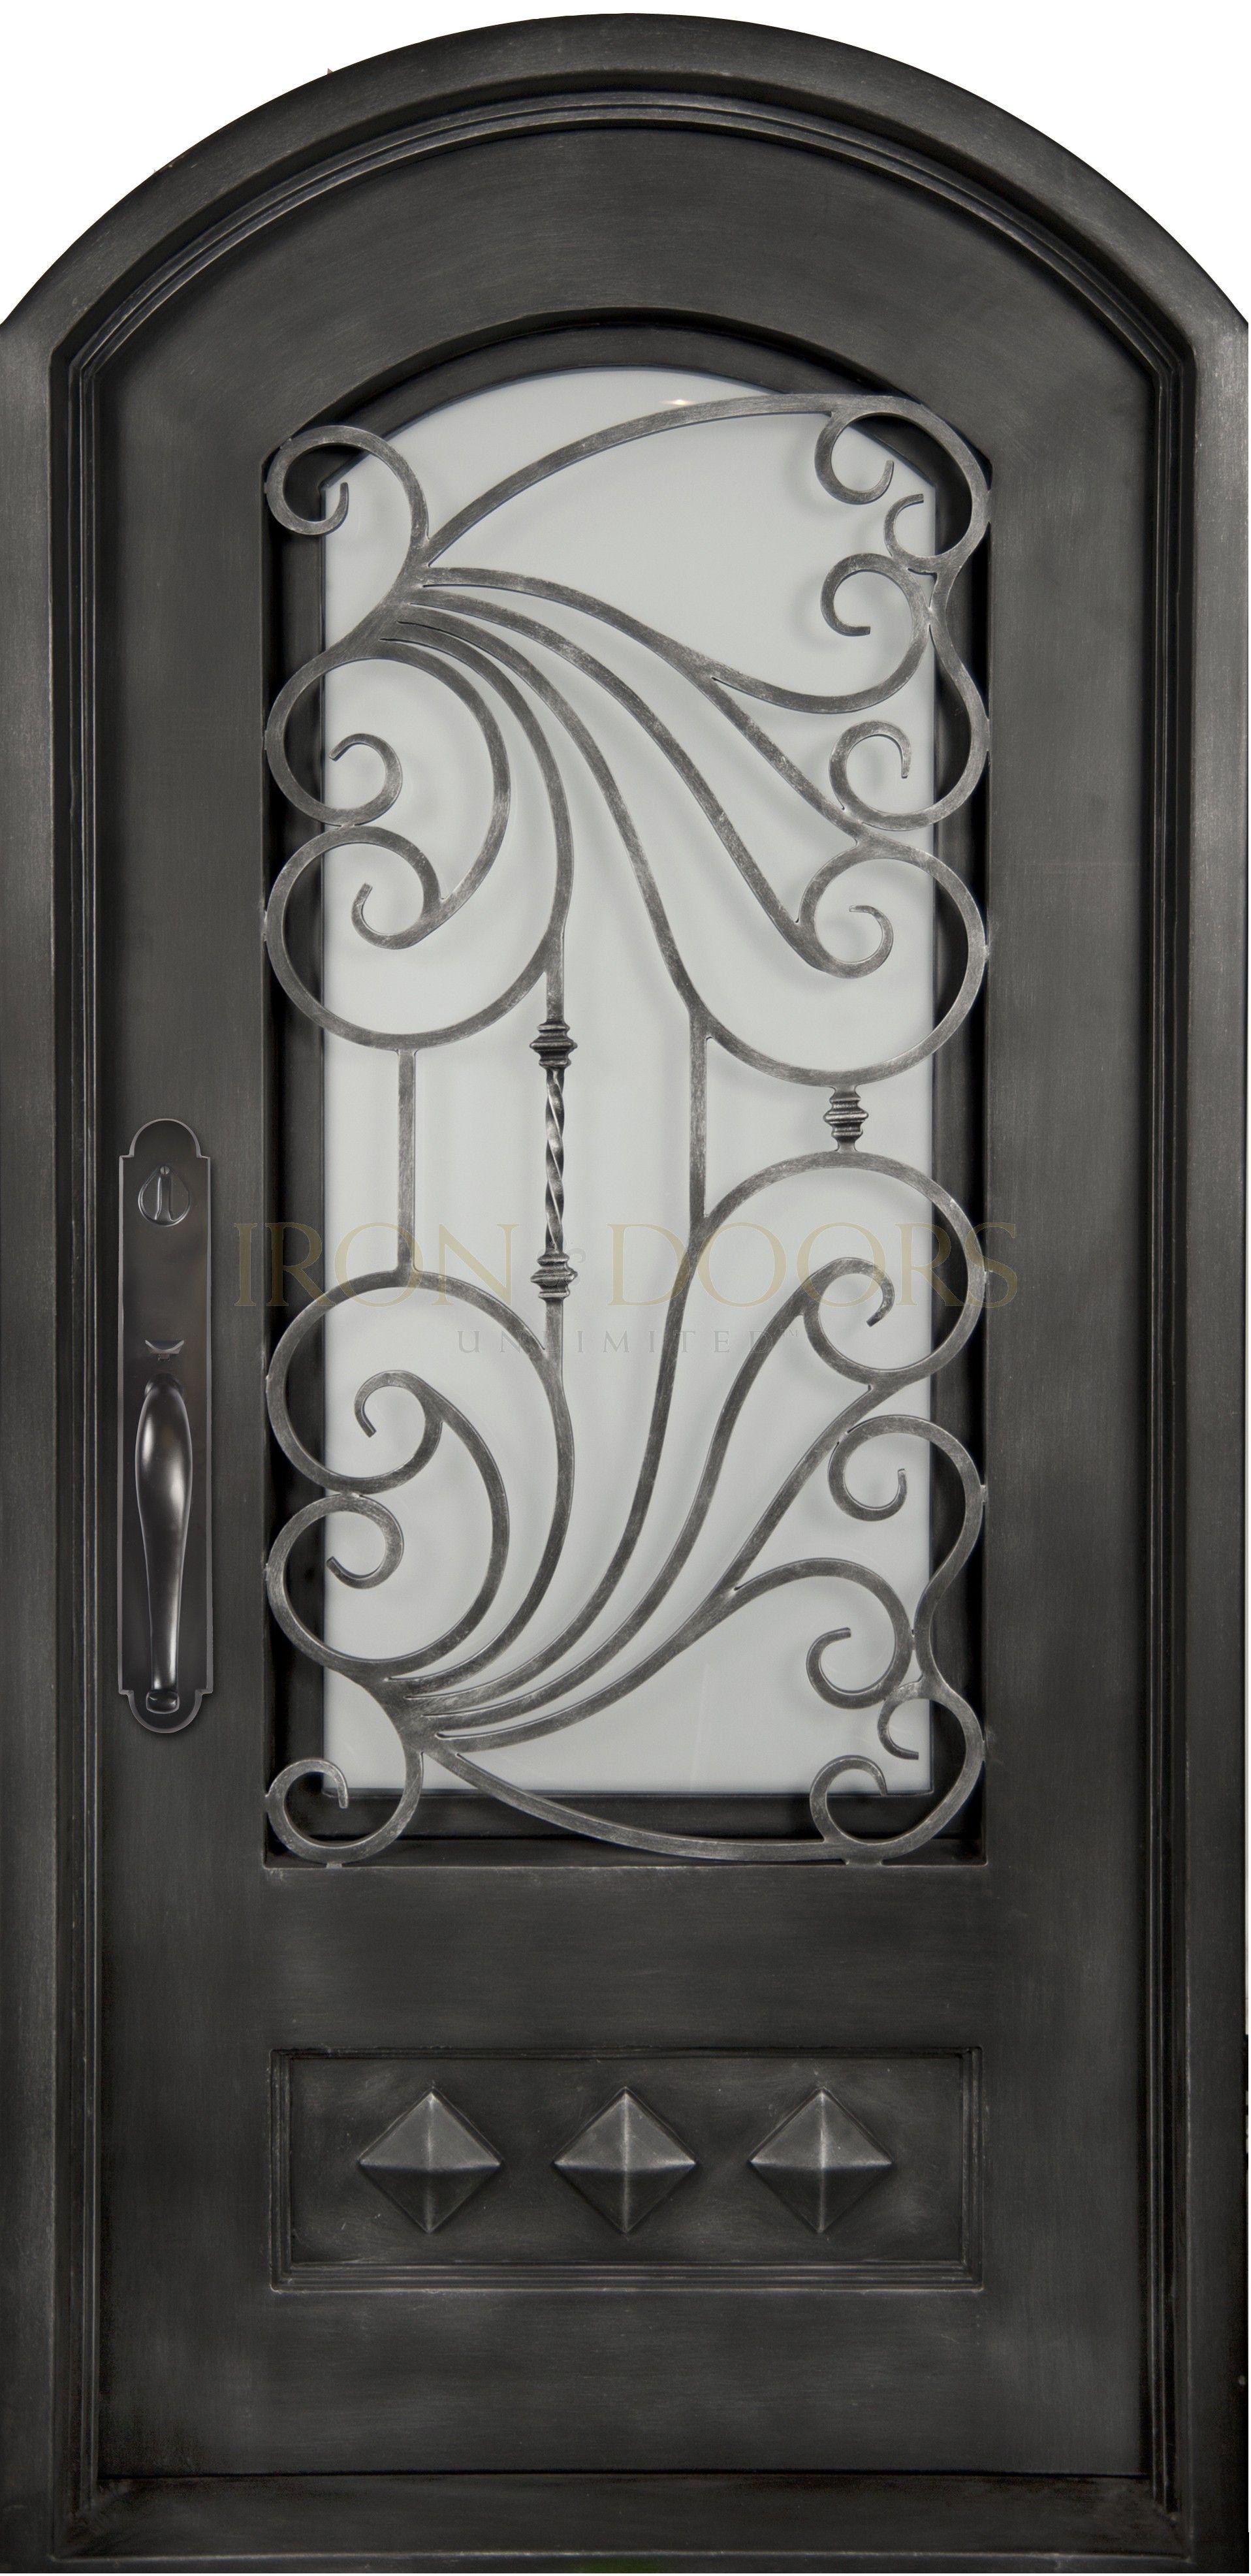 Iron Doors Unlimited - Mara Marea™ & Iron Doors Unlimited - Mara Marea™ | ковка | Pinterest | Iron Doors ...